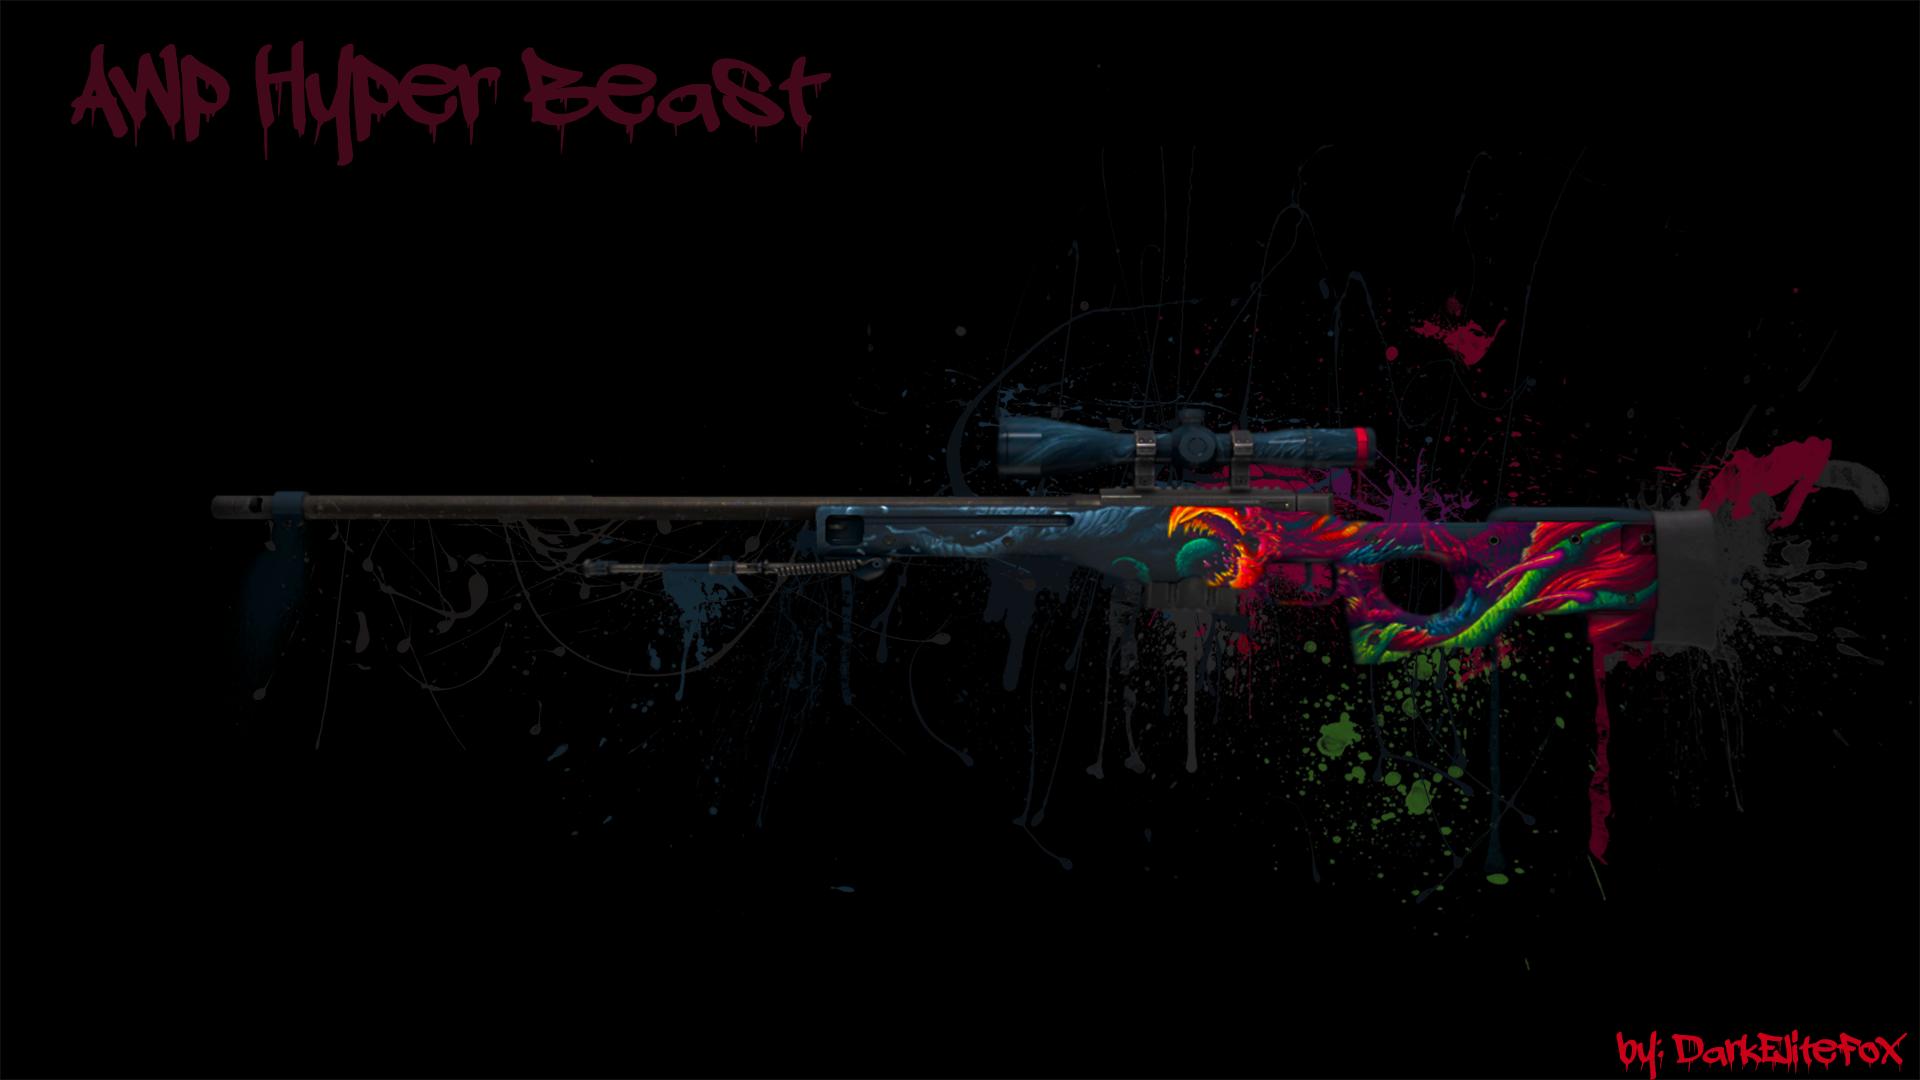 AWP Hyper Beast Wallpaper Picture  ID 2155